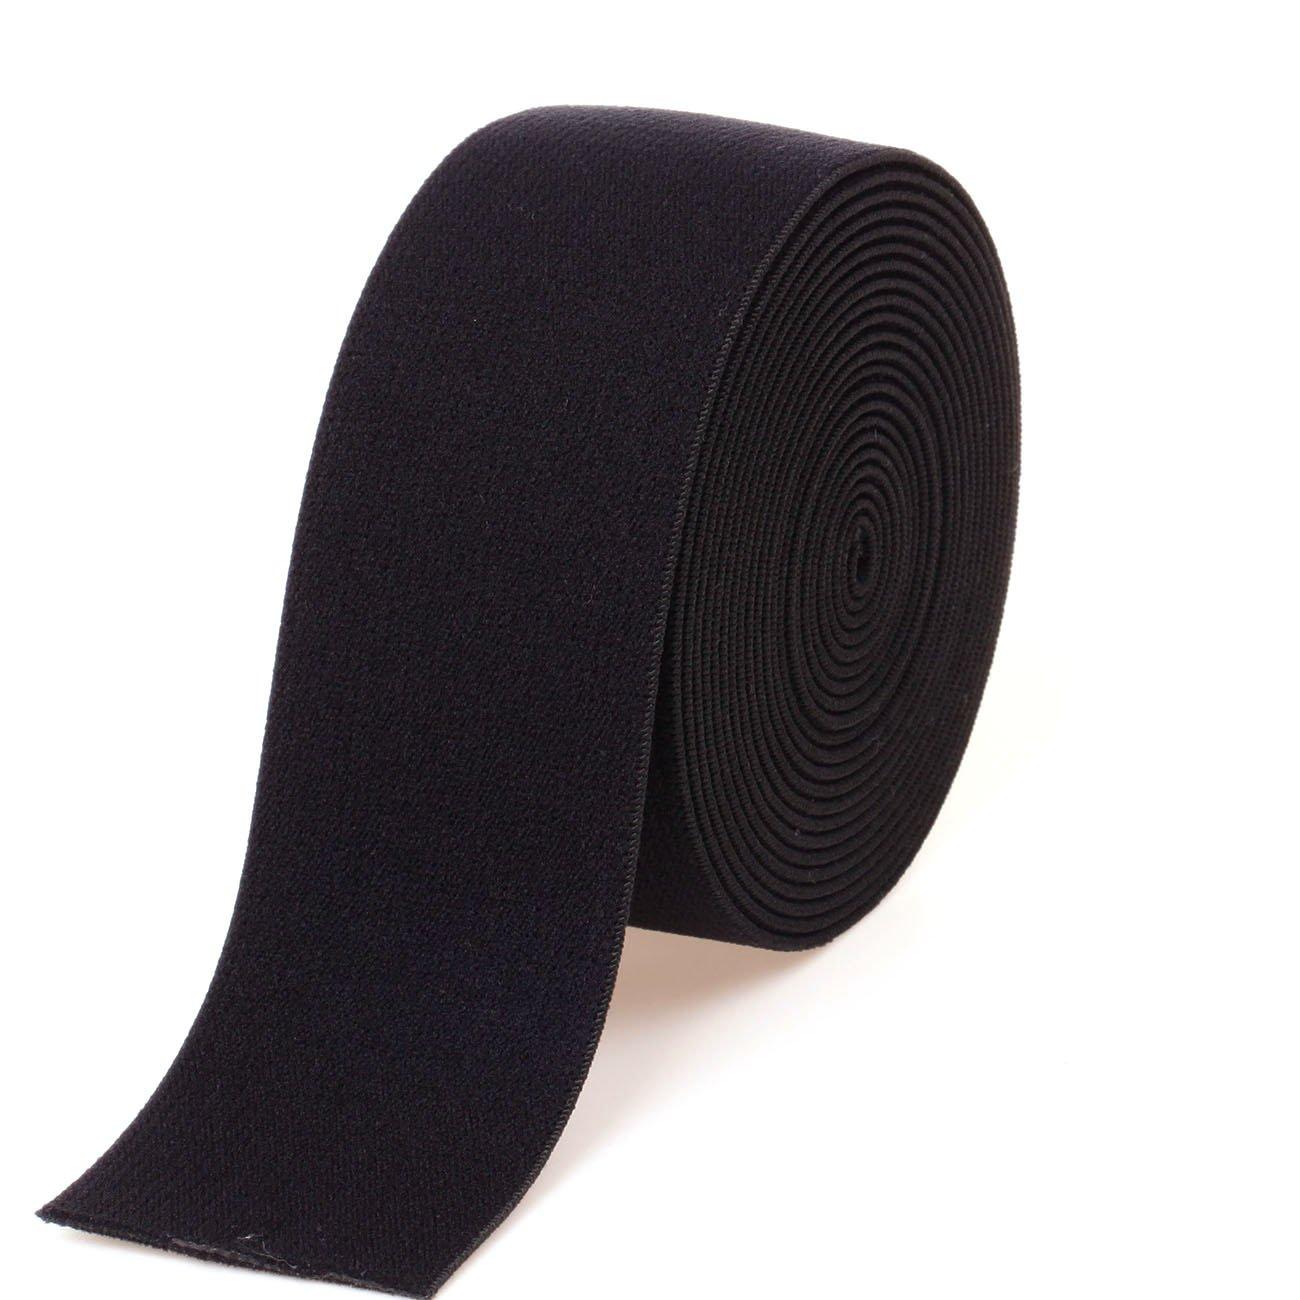 Cotowin Black peluche elastico, comodo da cucire elastico in vita fascia, Black, 1.25' 1.25 XINZHEYUAN